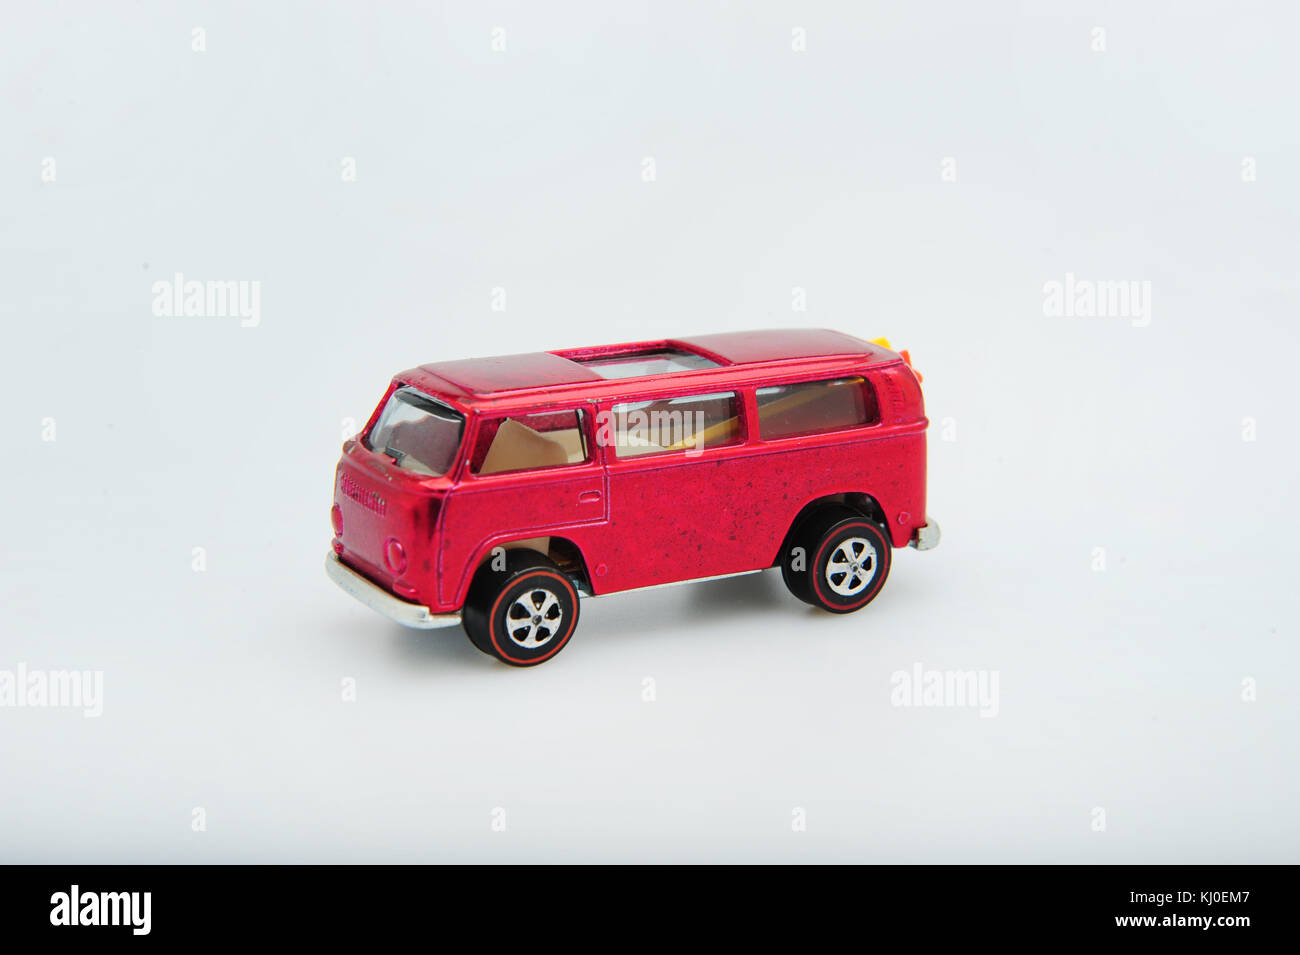 toys-classic-vintage-hot-wheels-cars-made-by-mattel-usa-miniature-KJ0EM7.jpg